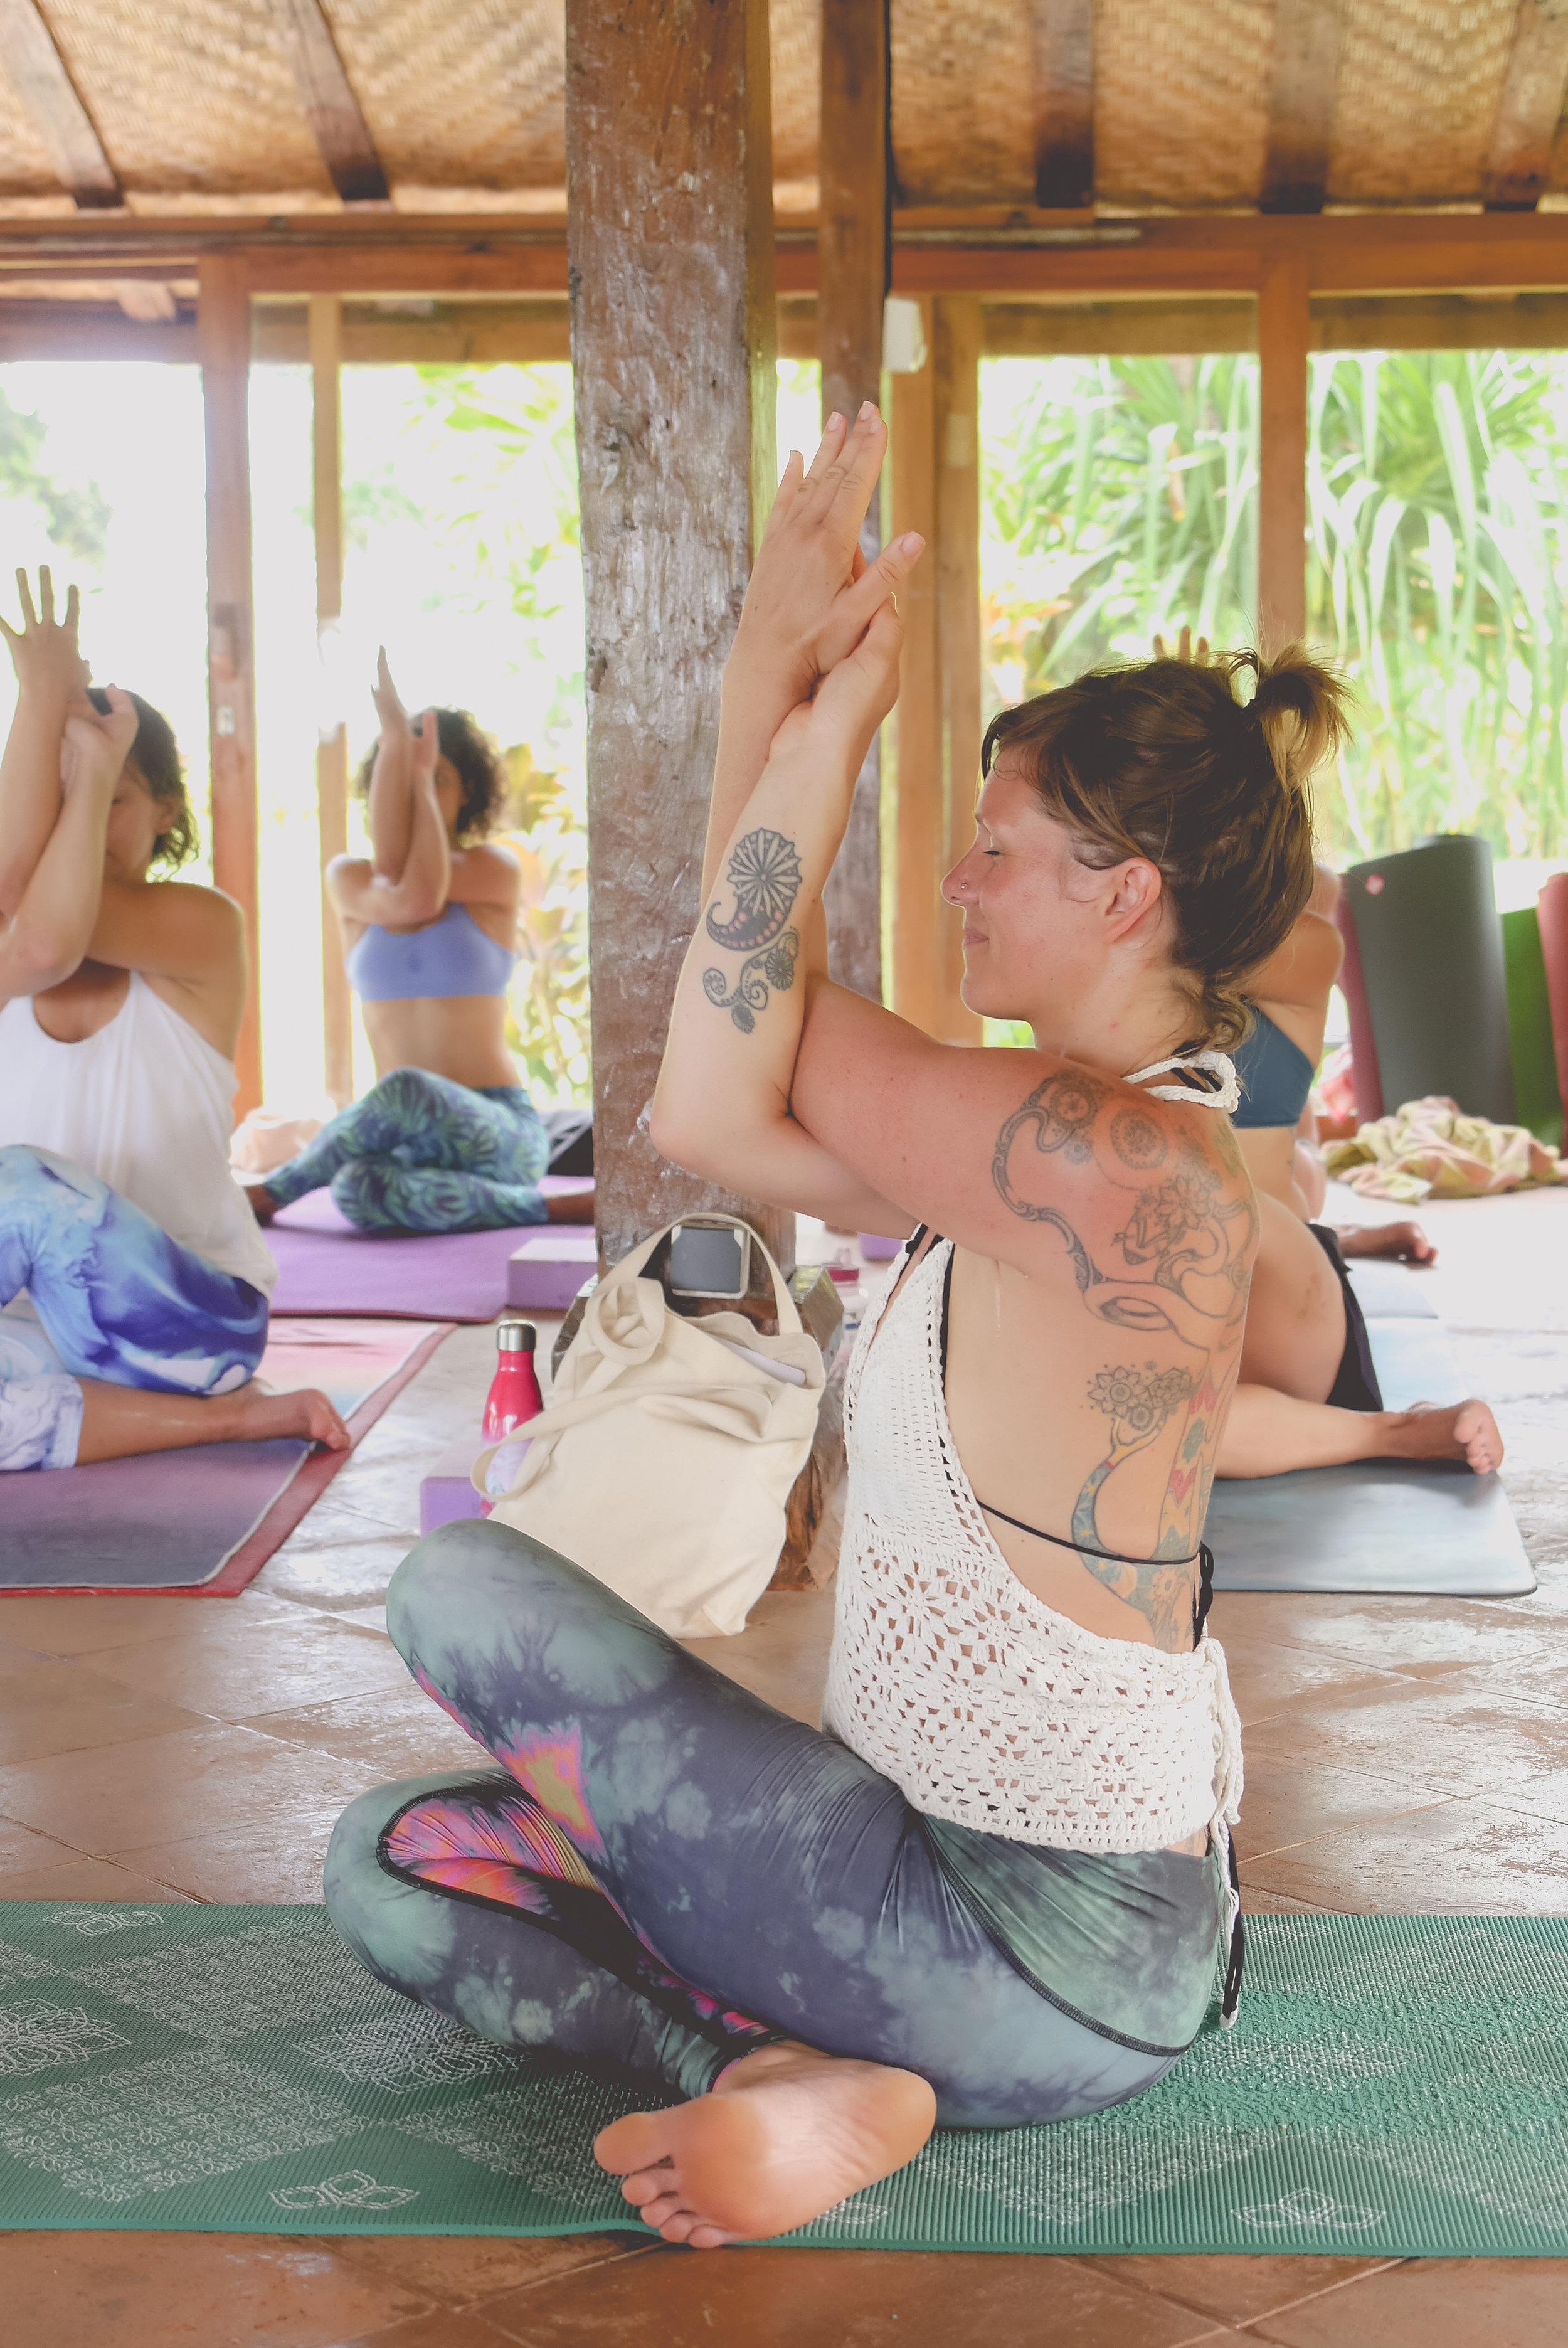 Demo time. Photo:Exhale Yoga Retreats.